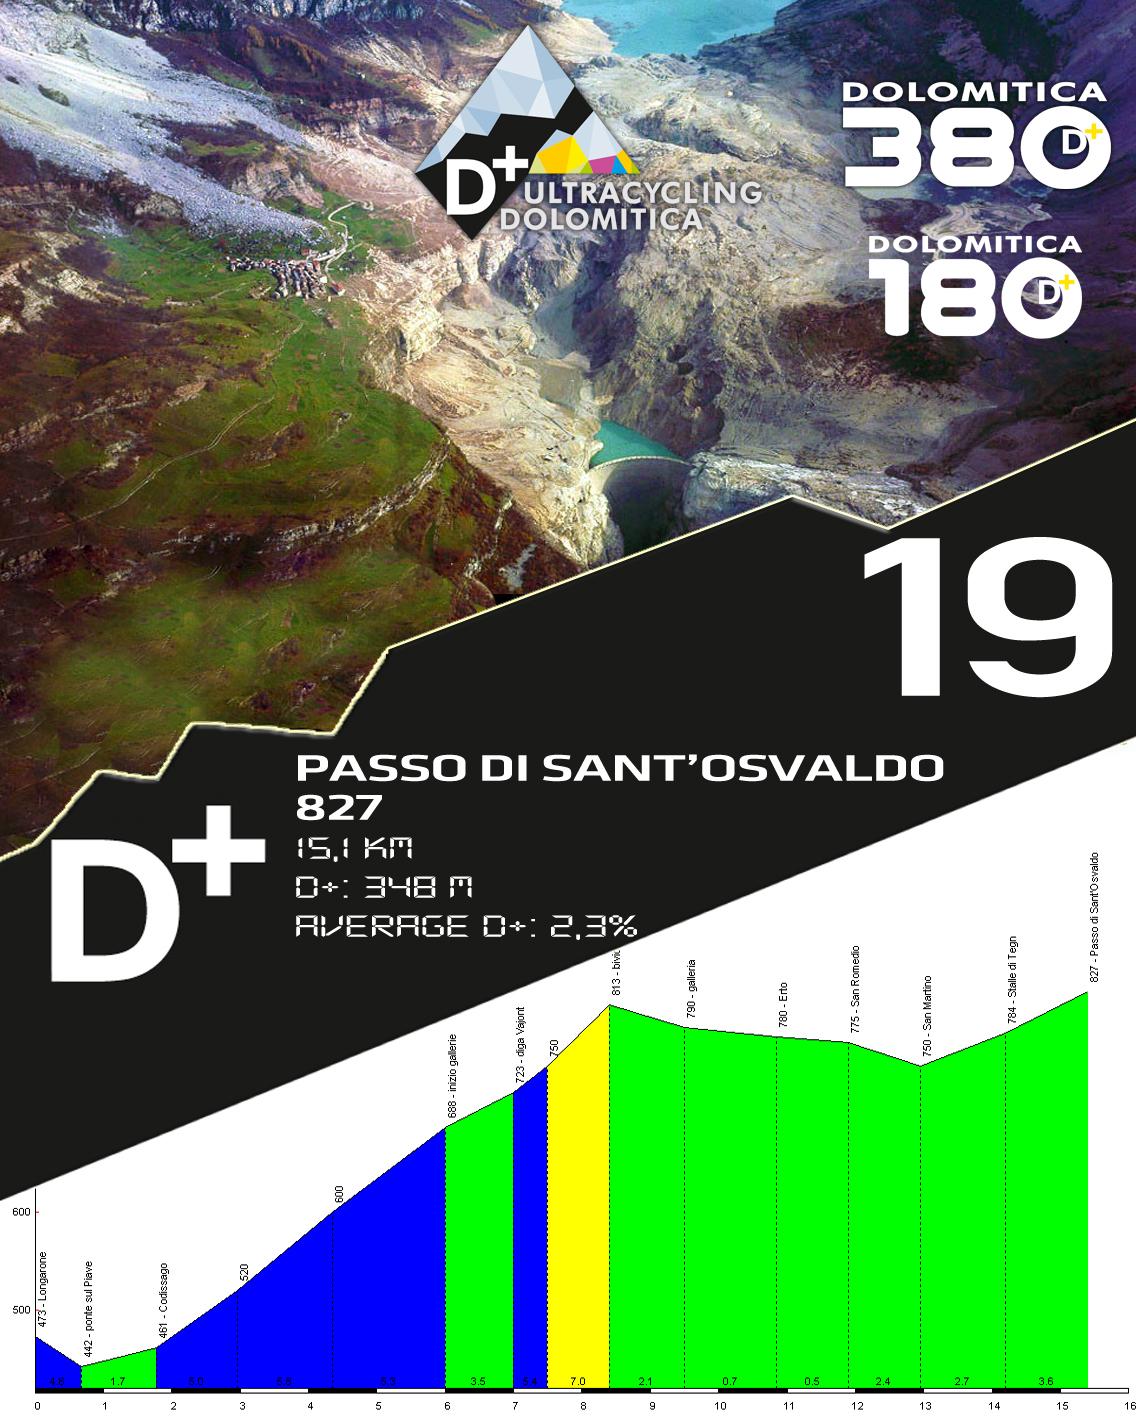 PASSO SANT'OSVALDO D+